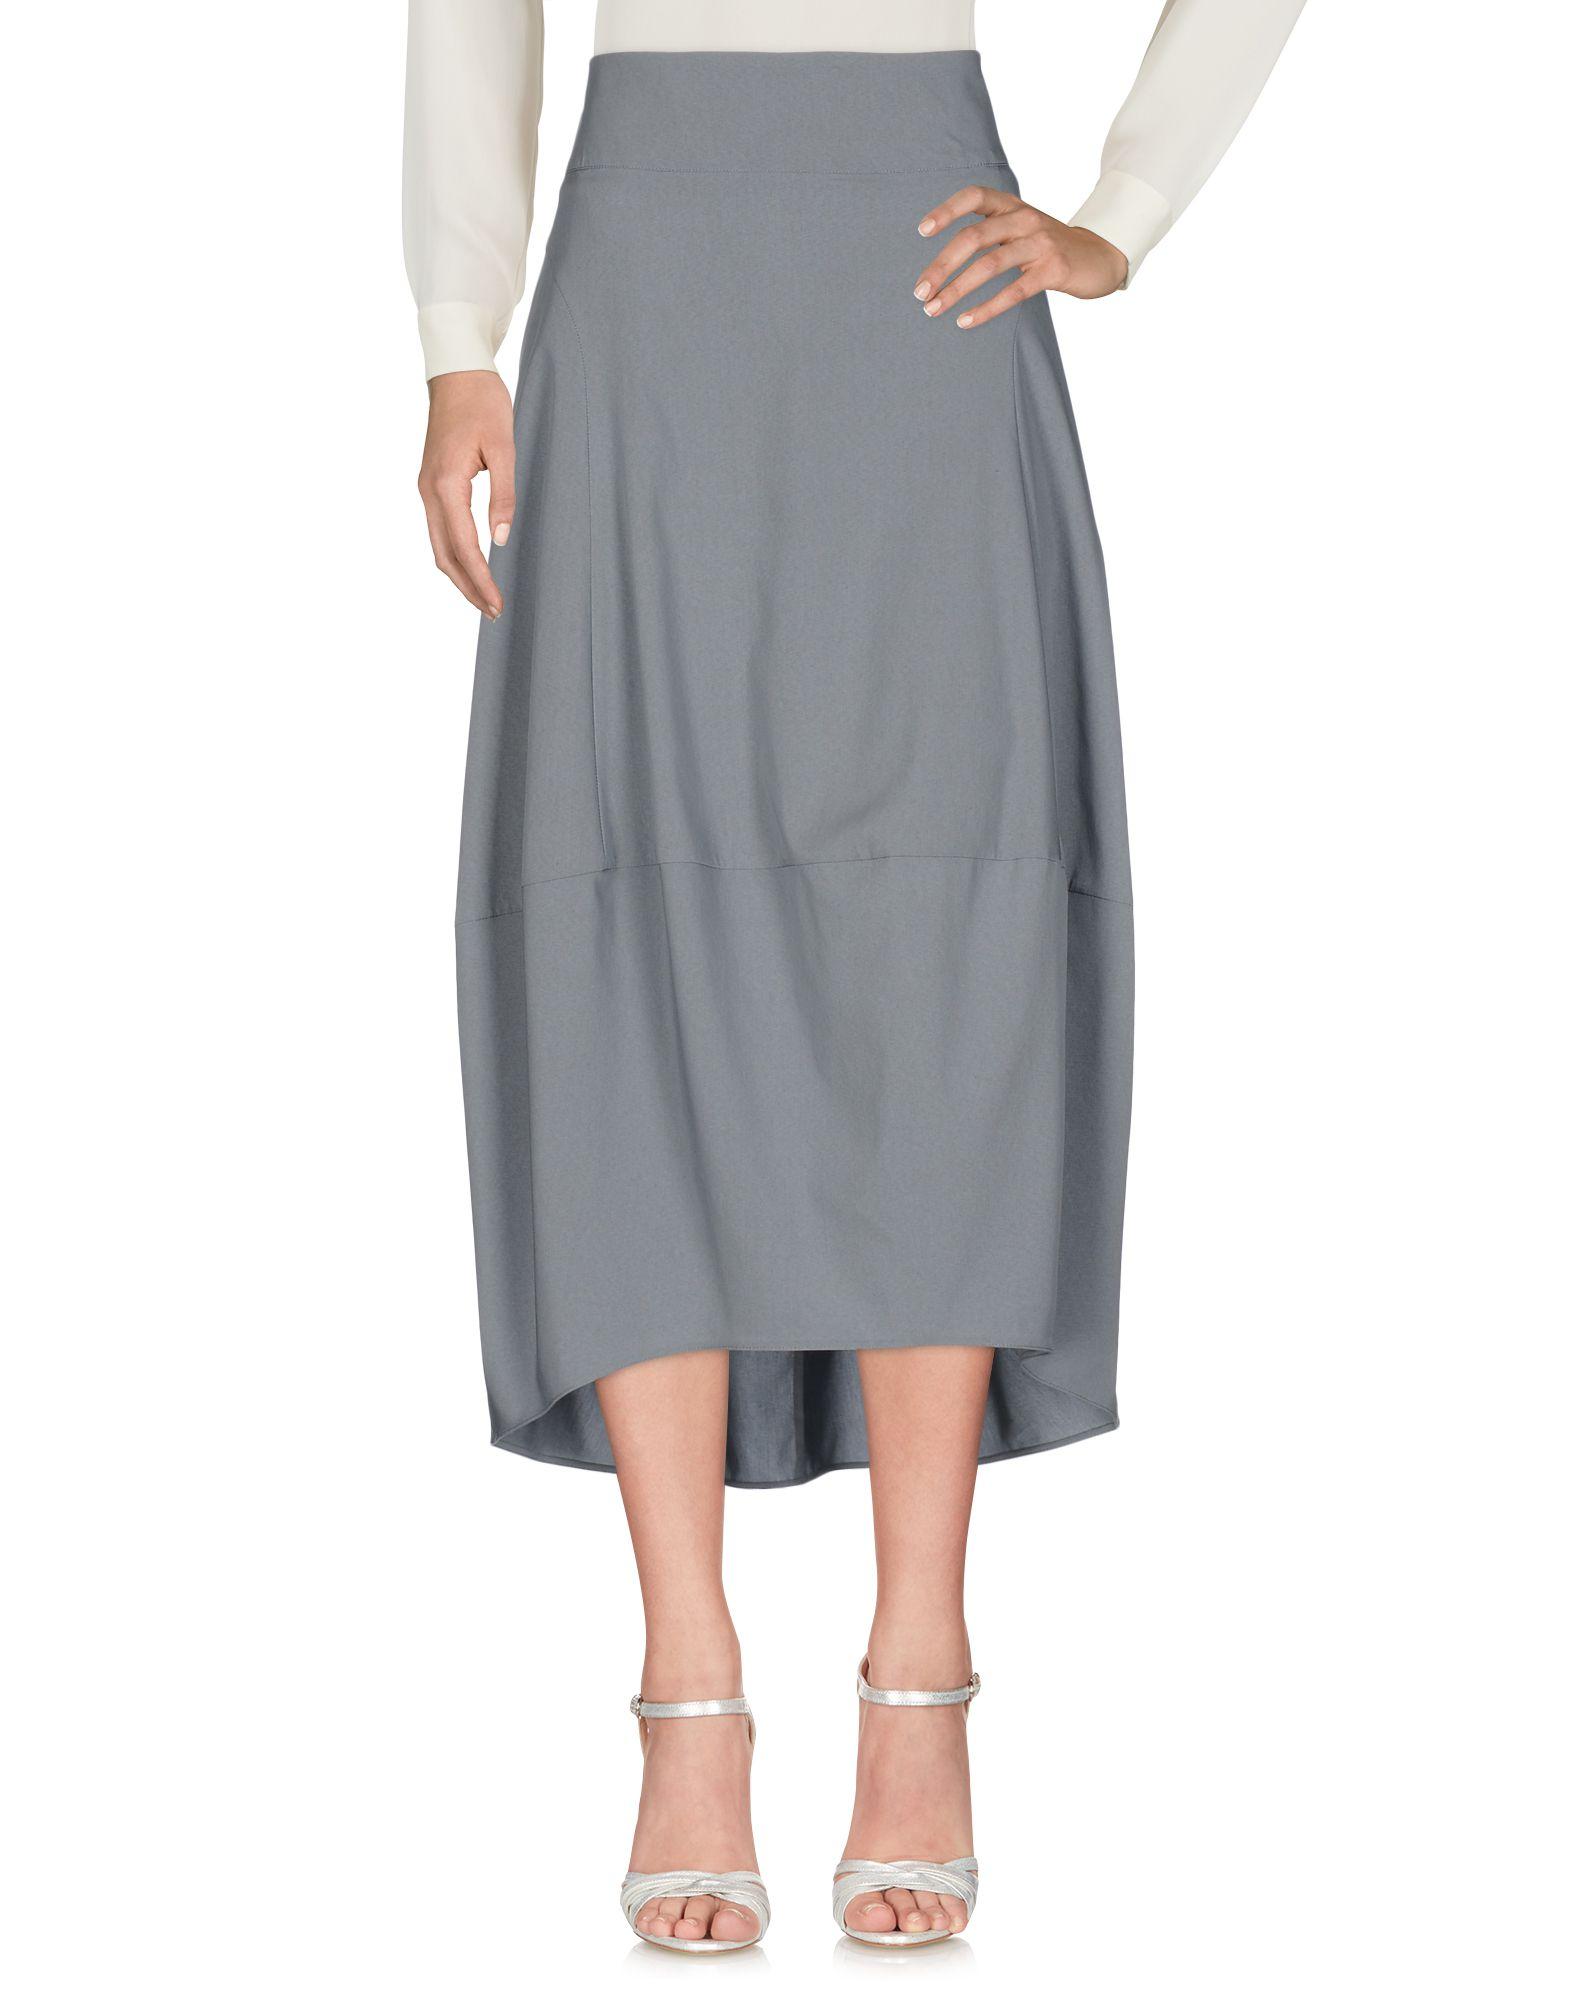 OBLIQUE CREATIONS Длинная юбка клепки для одежды three creations 1000 10 nailheads 80374